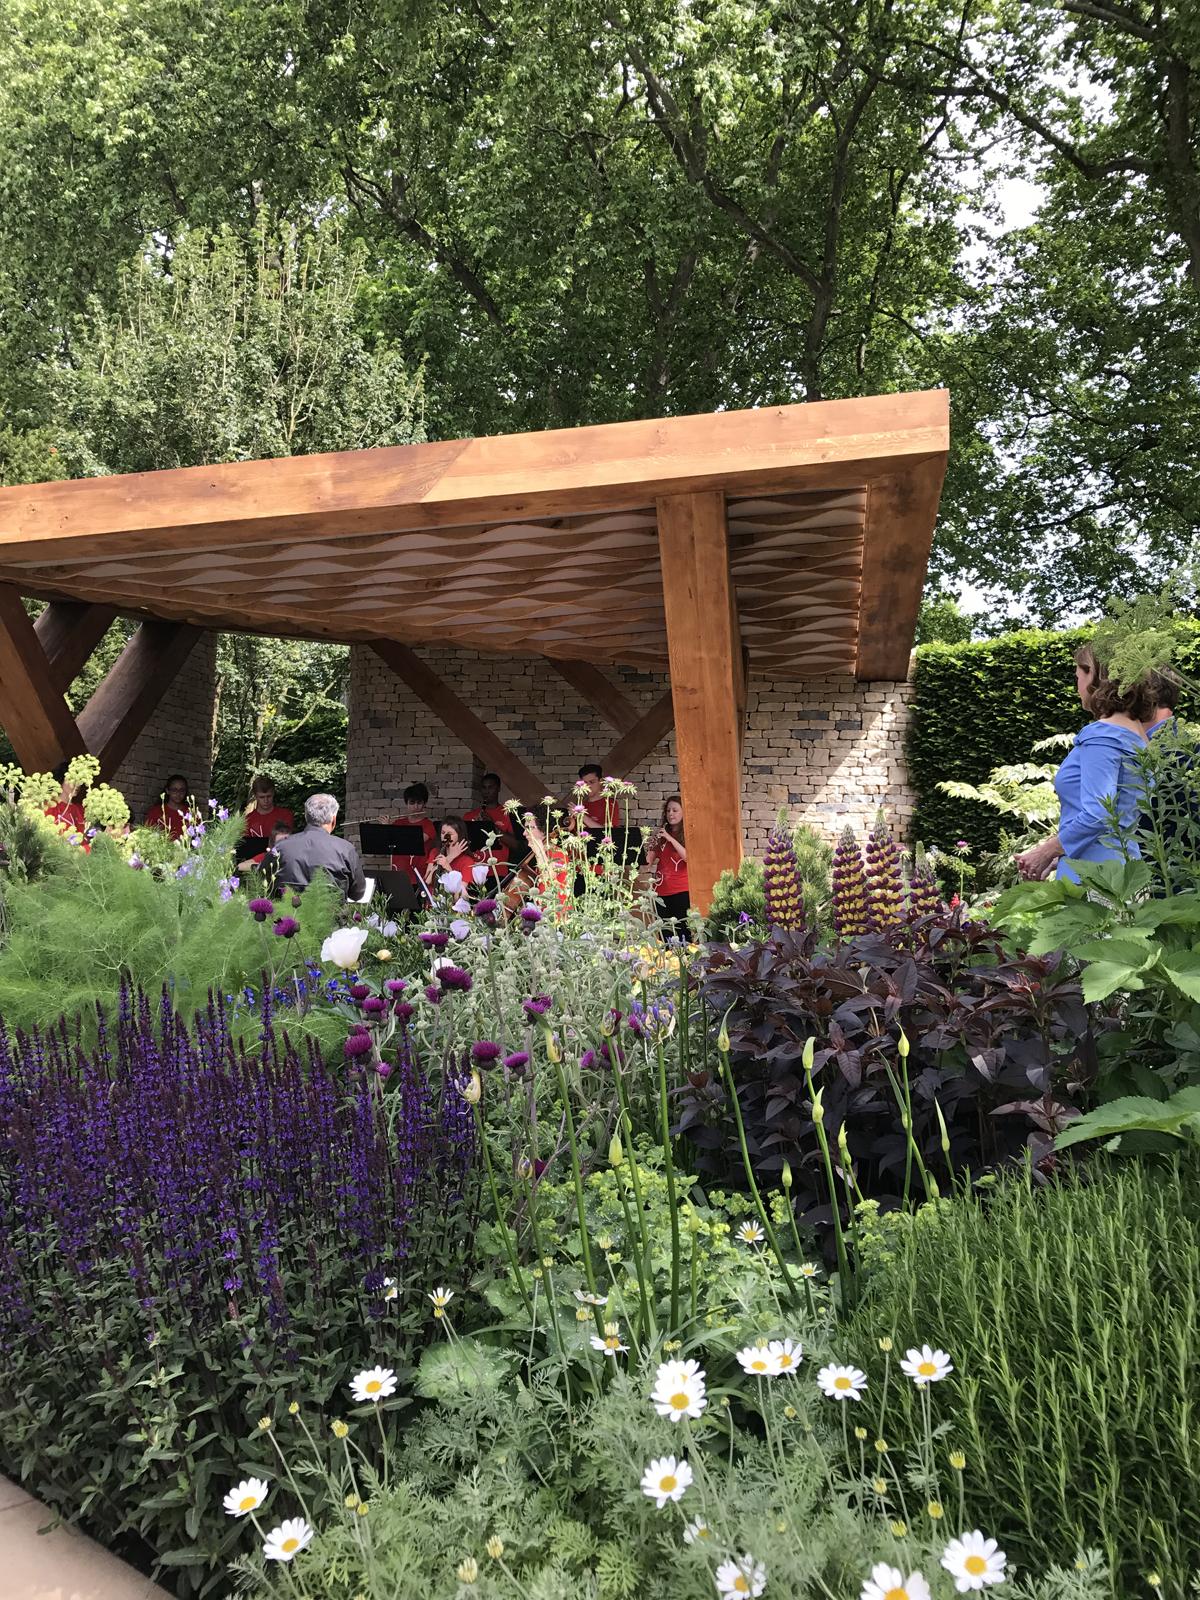 Rhs chelsea flower show sophie robinson - Chelsea garden show ...